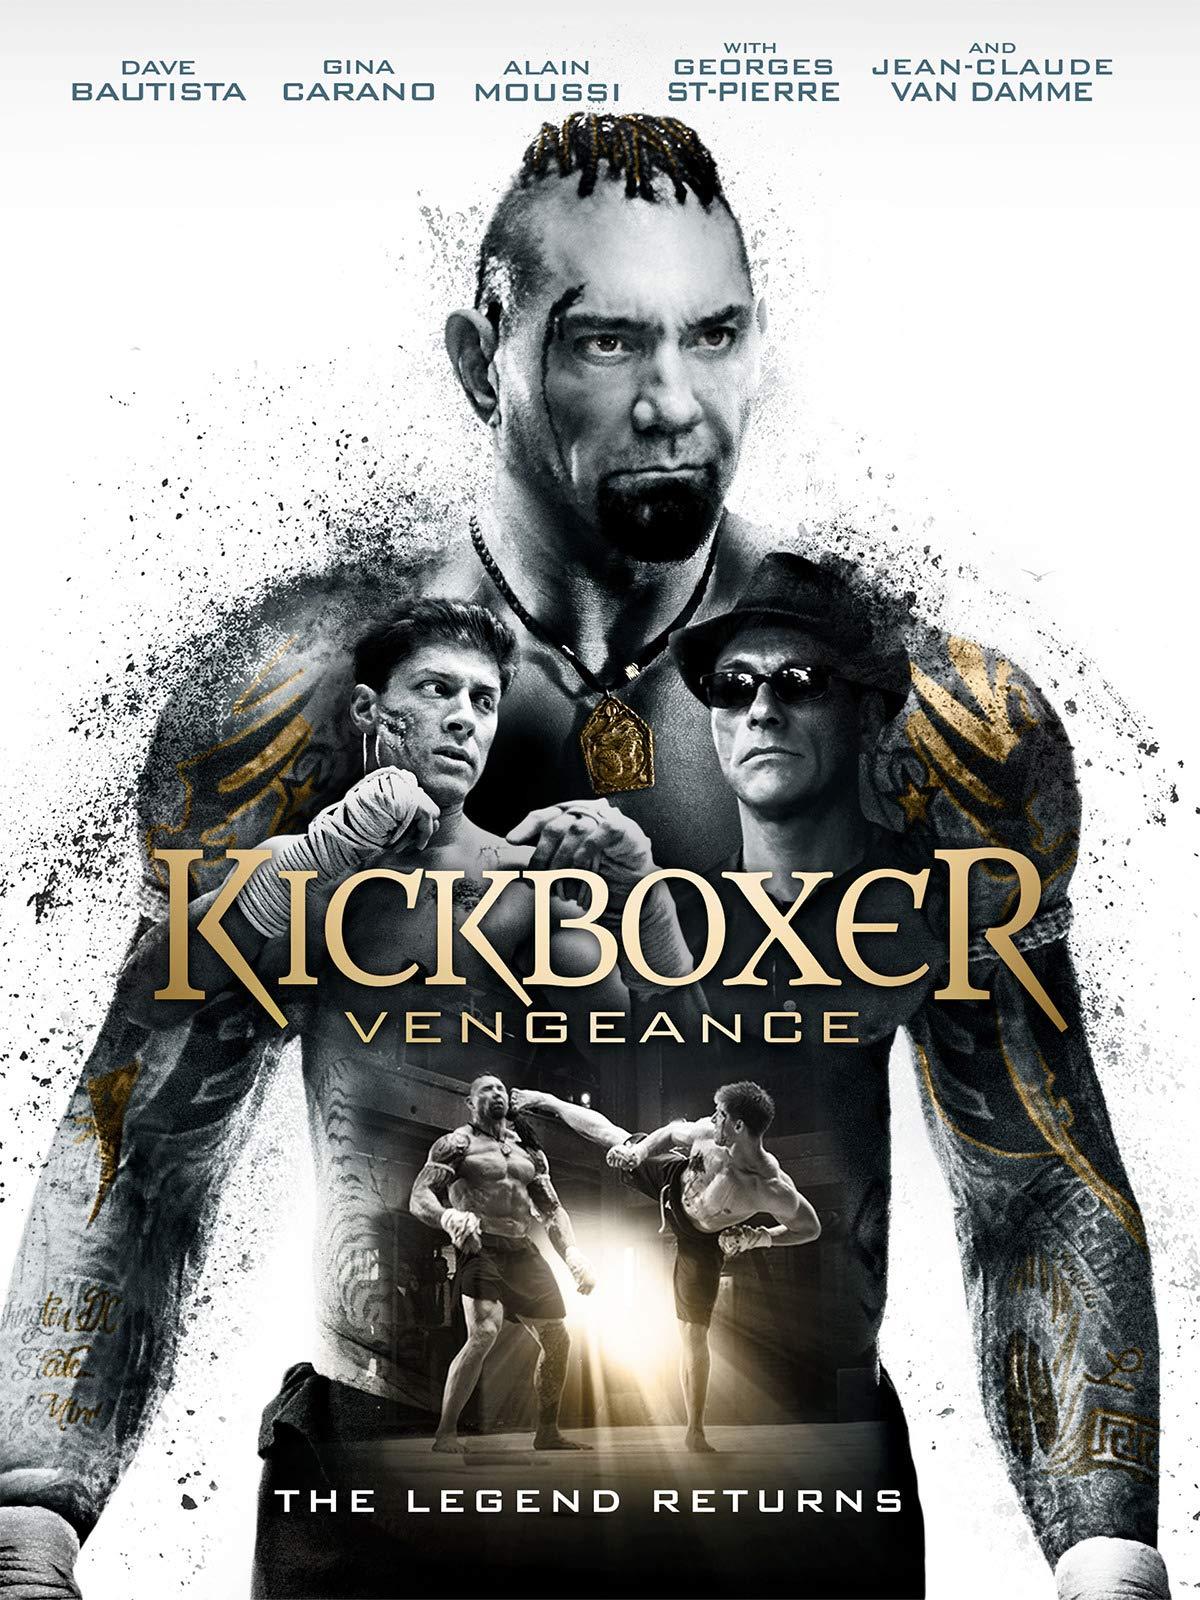 Kickboxer: Vengeance on Amazon Prime Video UK